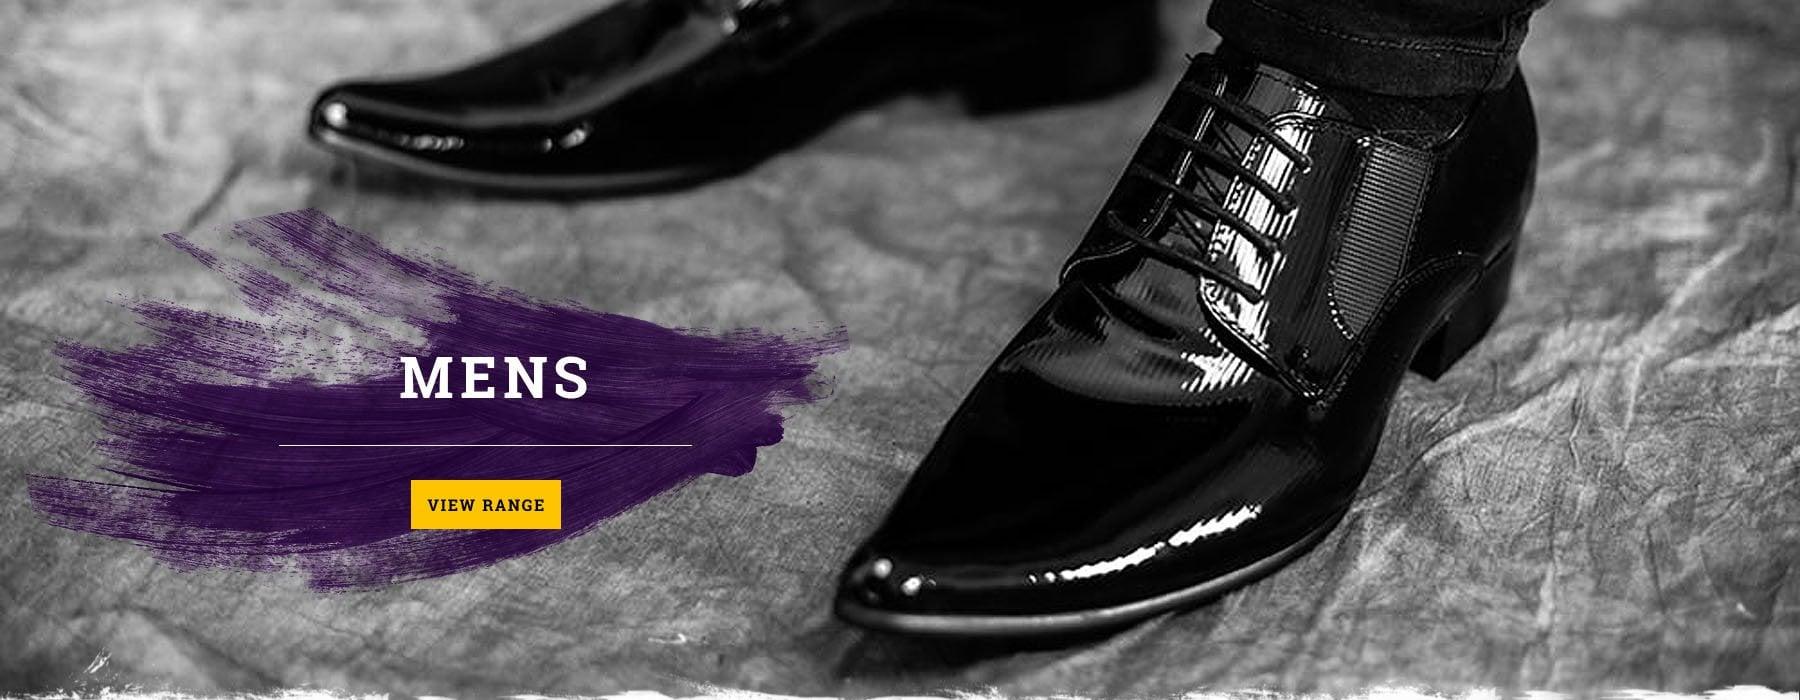 Scorpio Shoes Independent UK Shoe Shop Established 1960